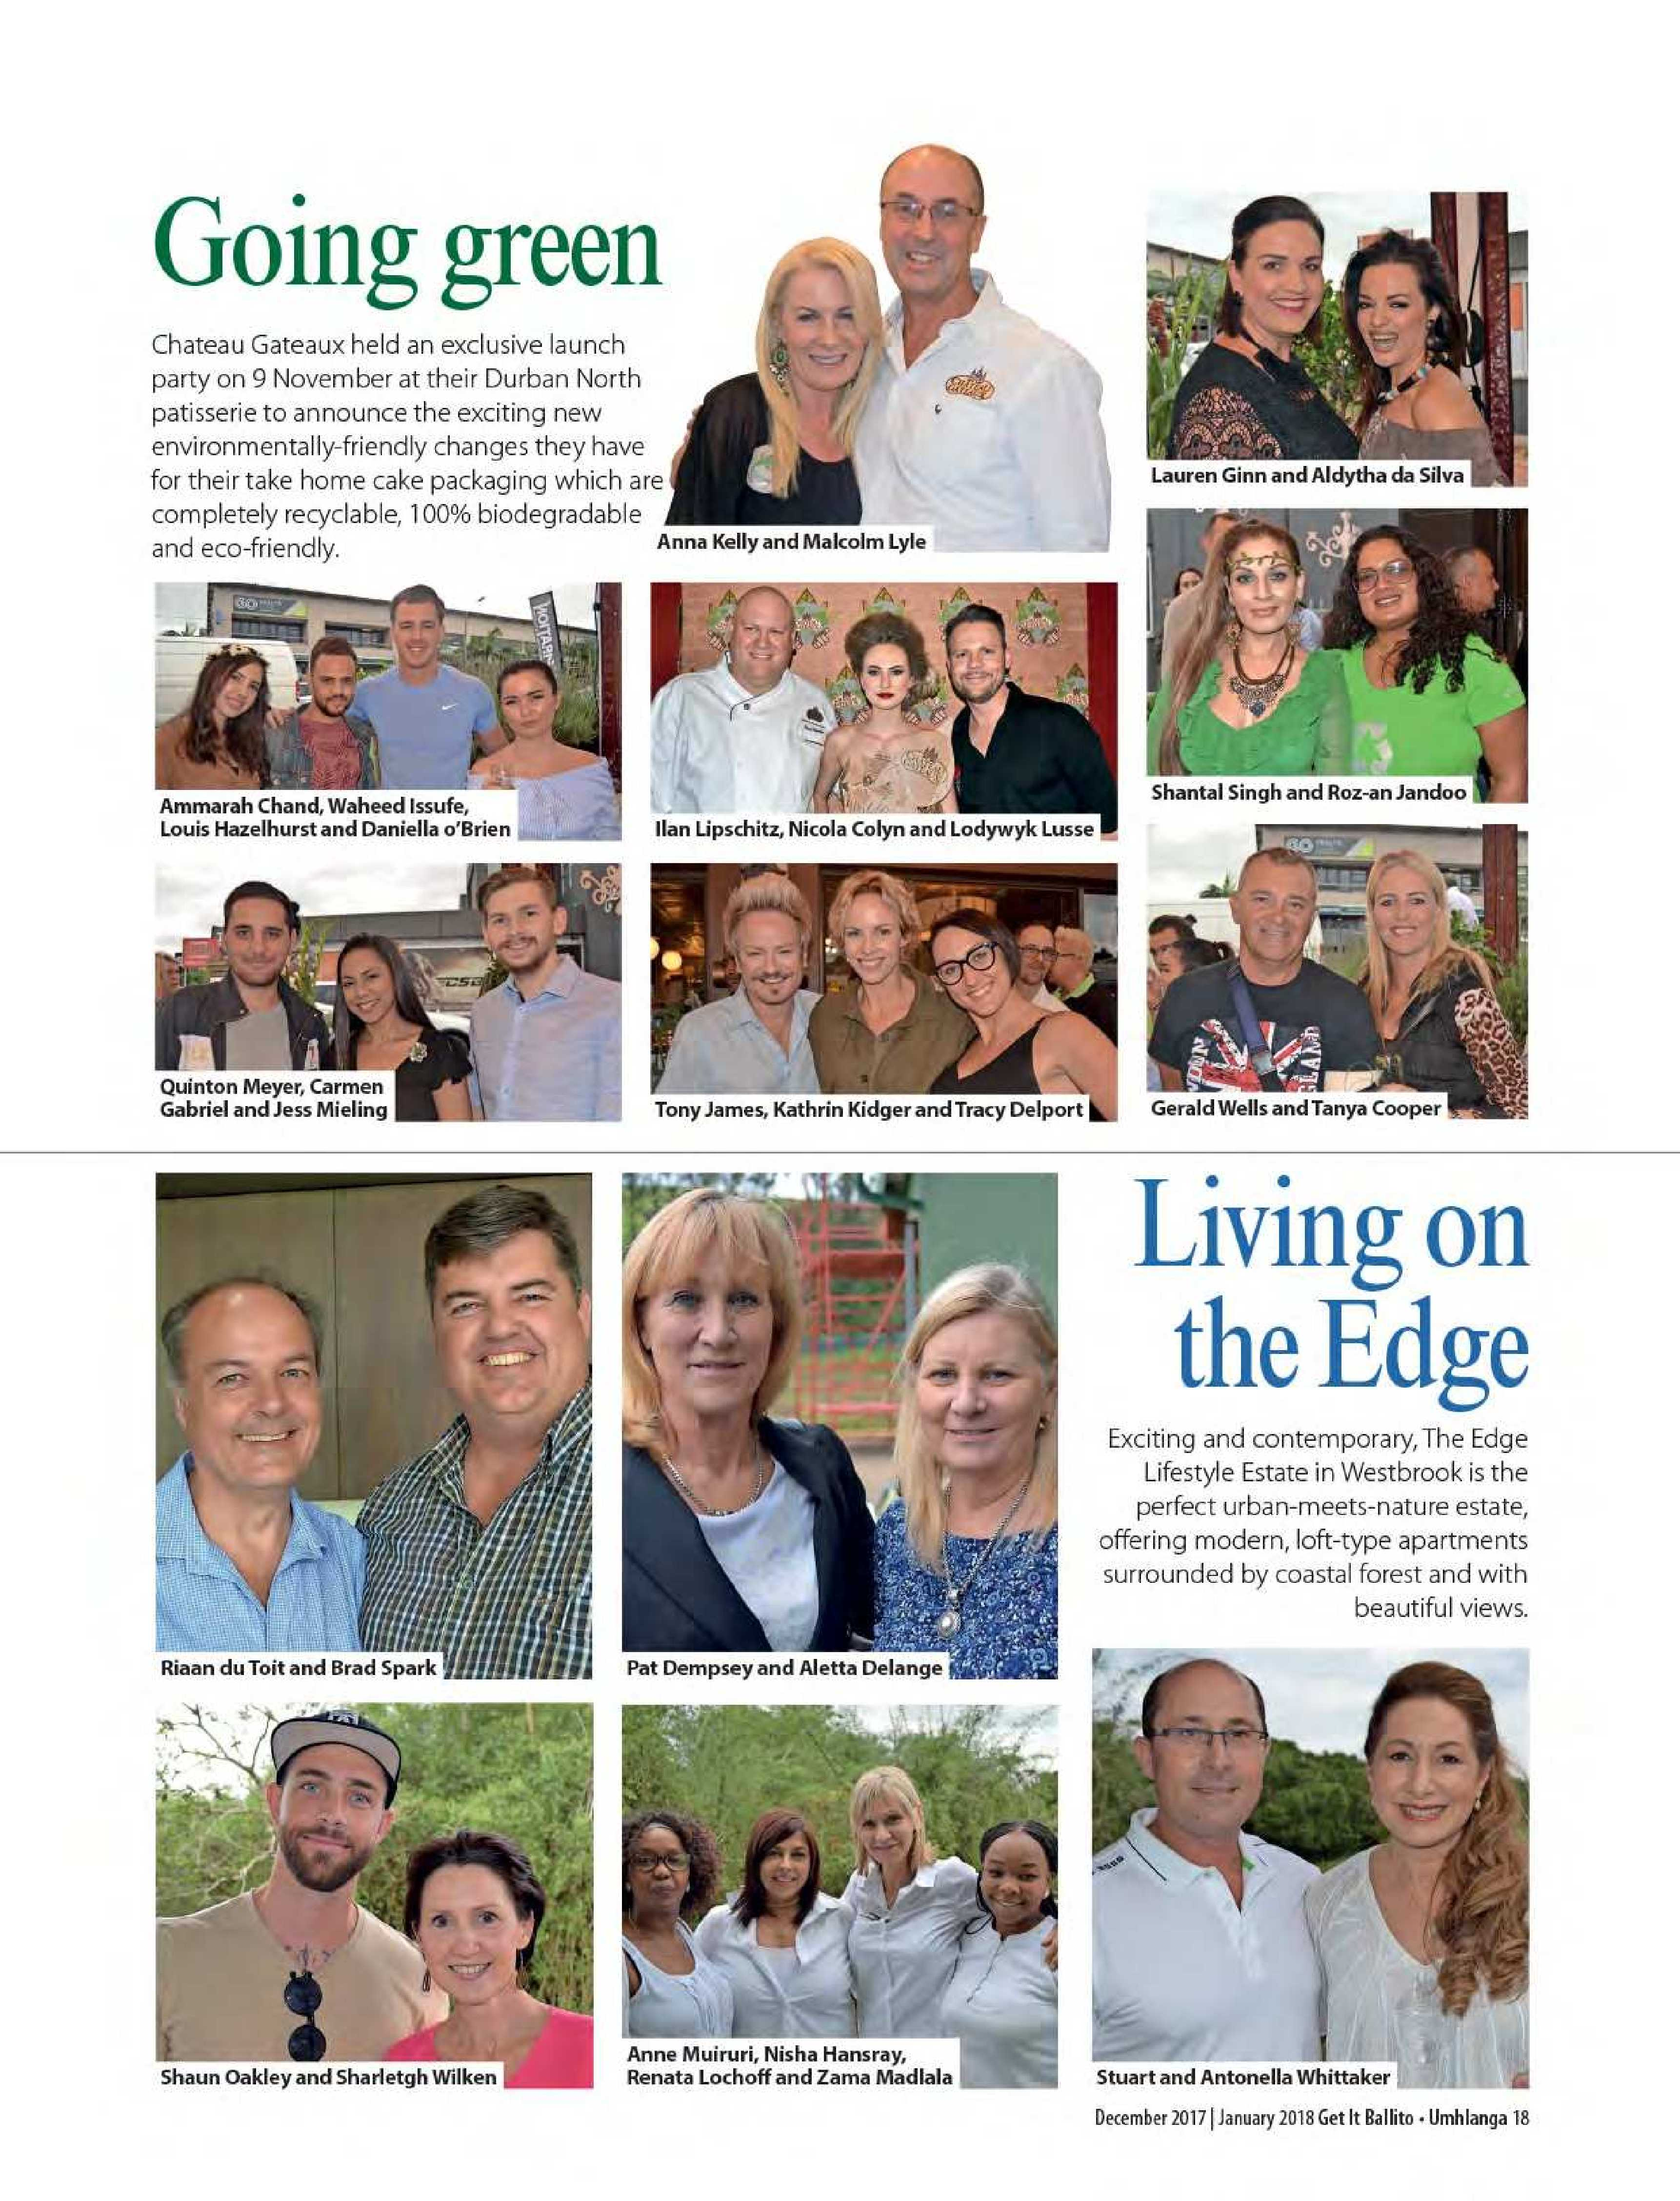 get-magazine-ballitoumhlanga-december-2017-january-2018-2-epapers-page-20